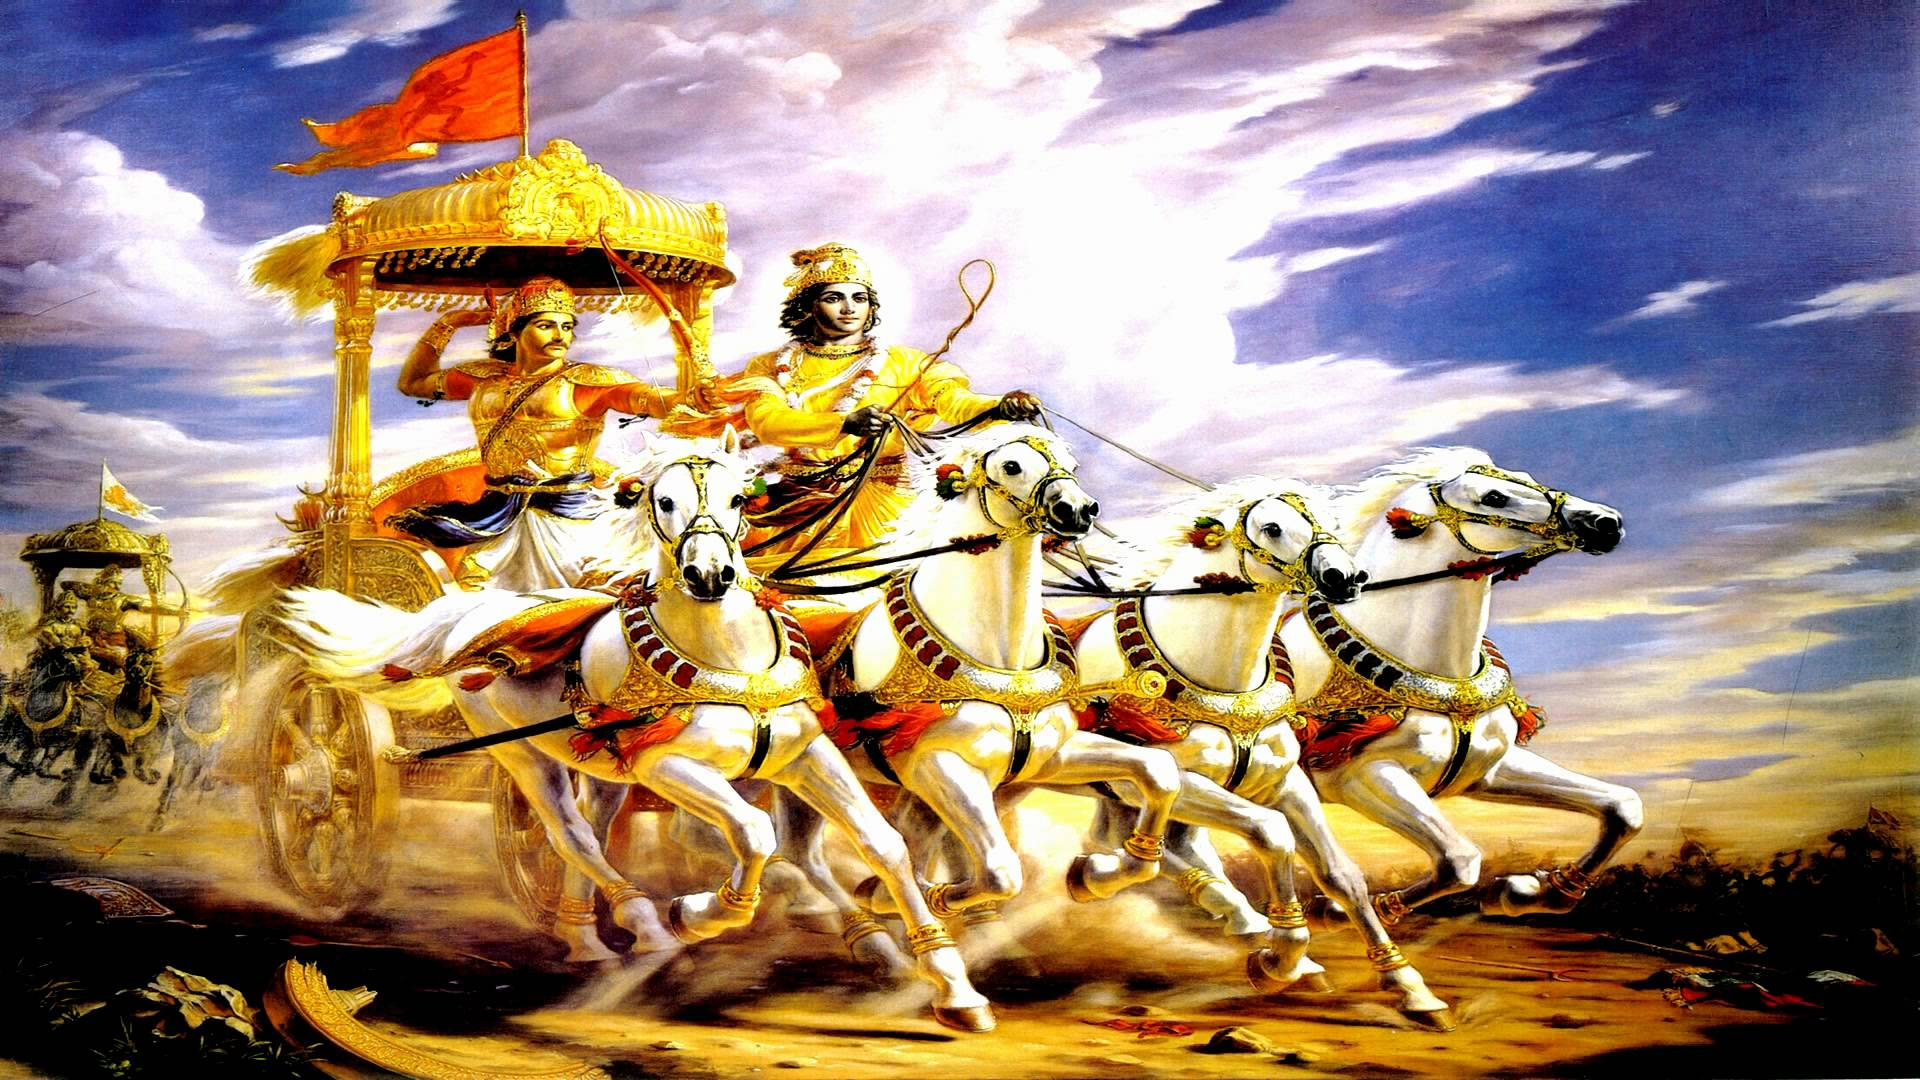 Bhagavad Gita Wallpapers 1920x1080